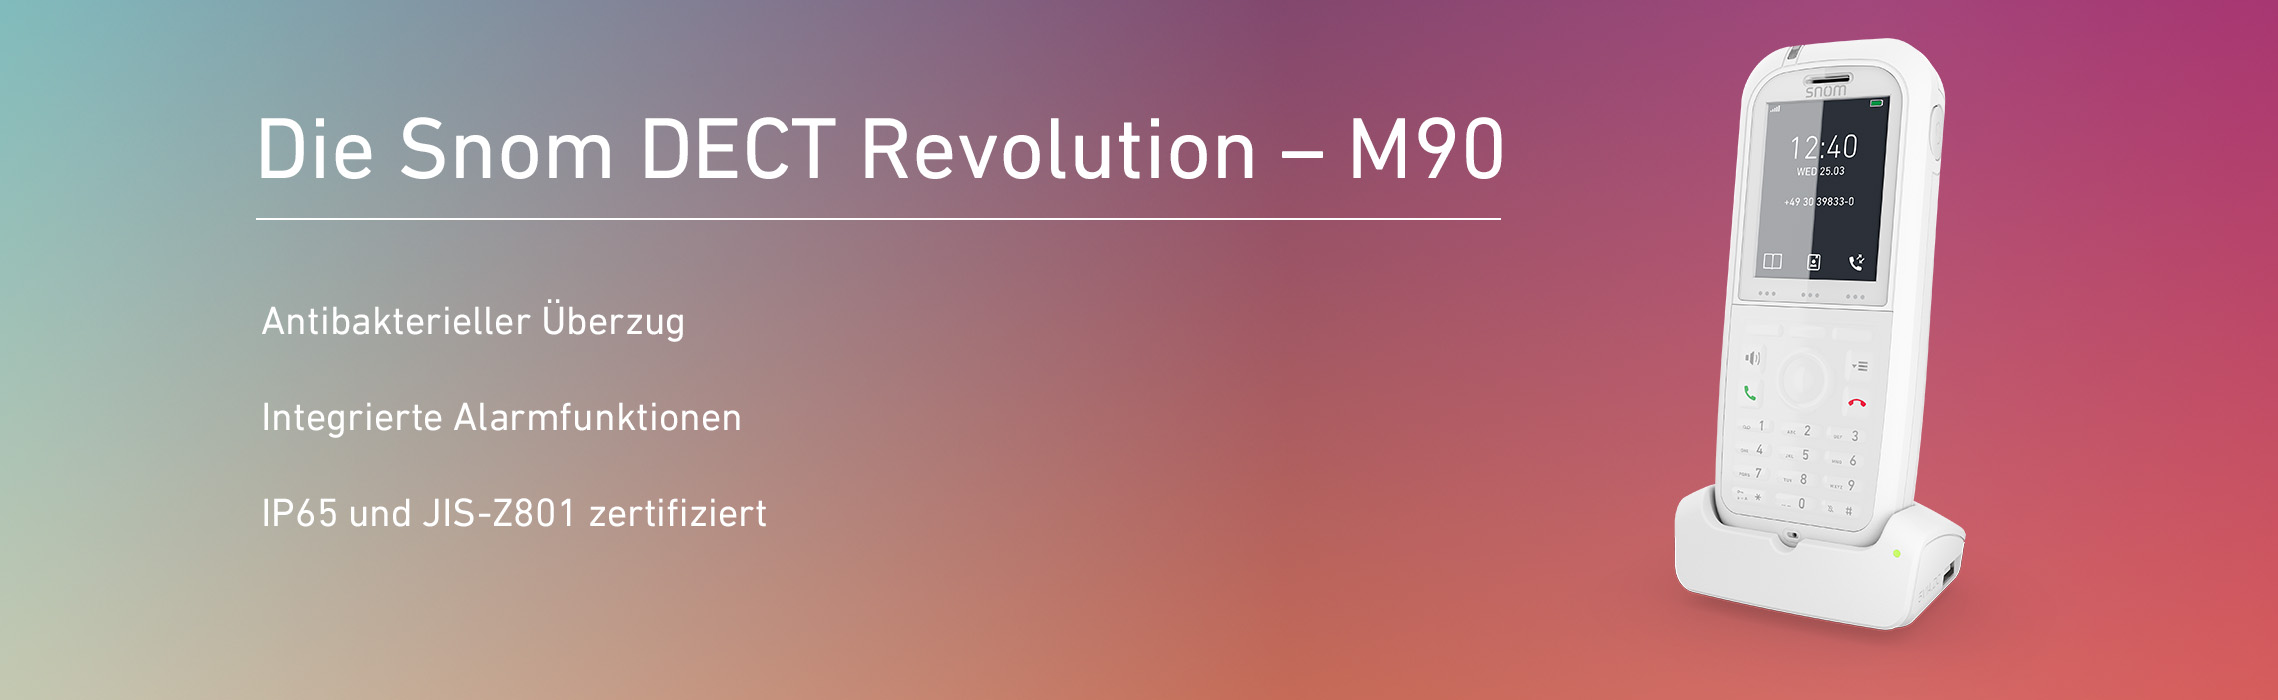 DECT_revolution_website_slider_m90_de.jpg